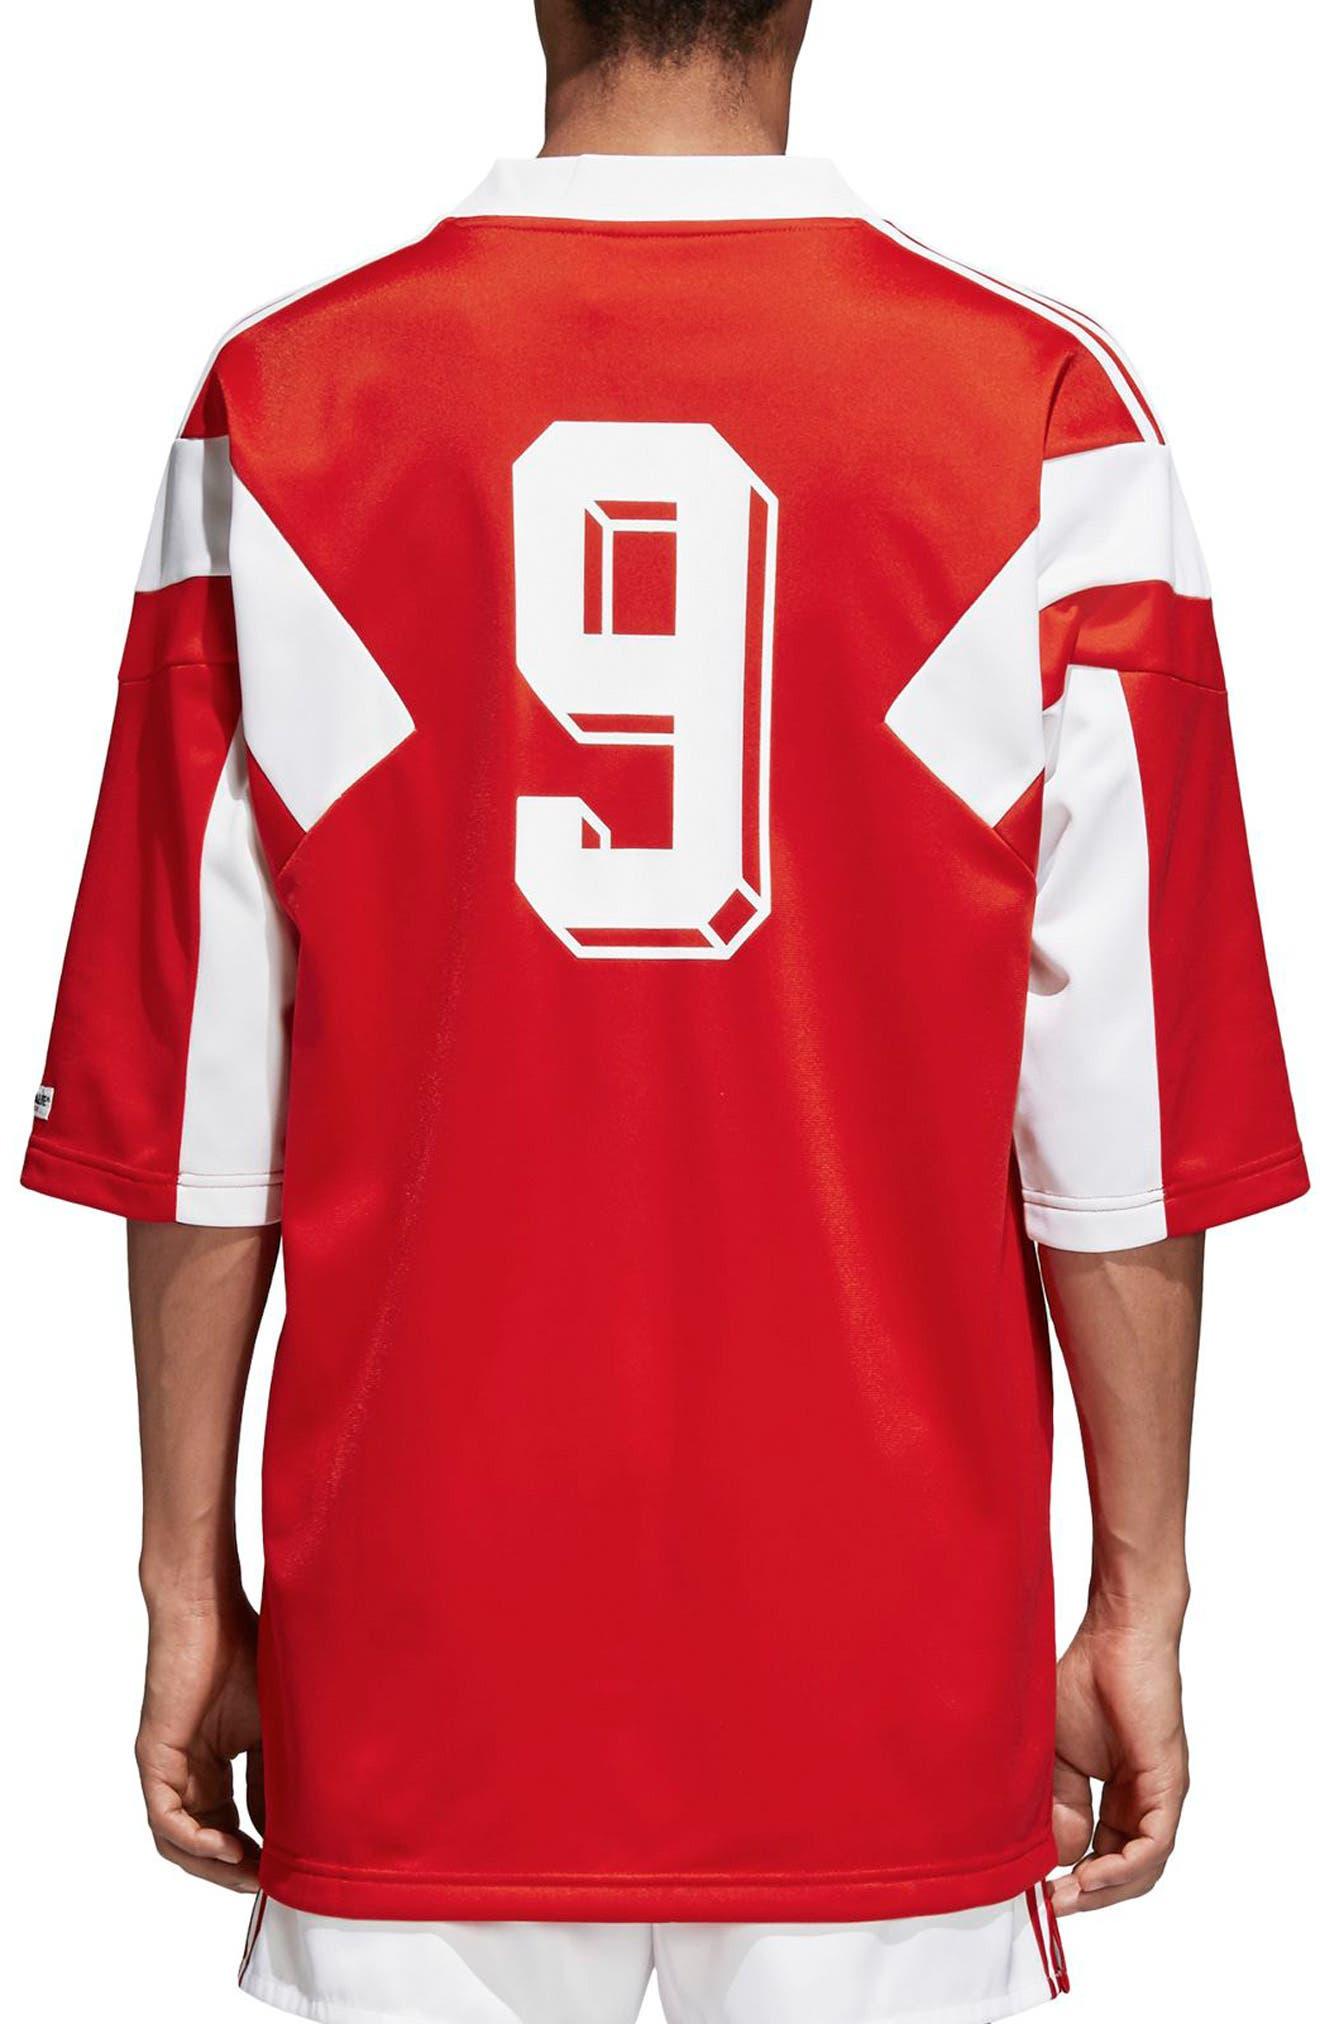 adidas Original Russia 1991 Soccer Jersey,                             Alternate thumbnail 2, color,                             610